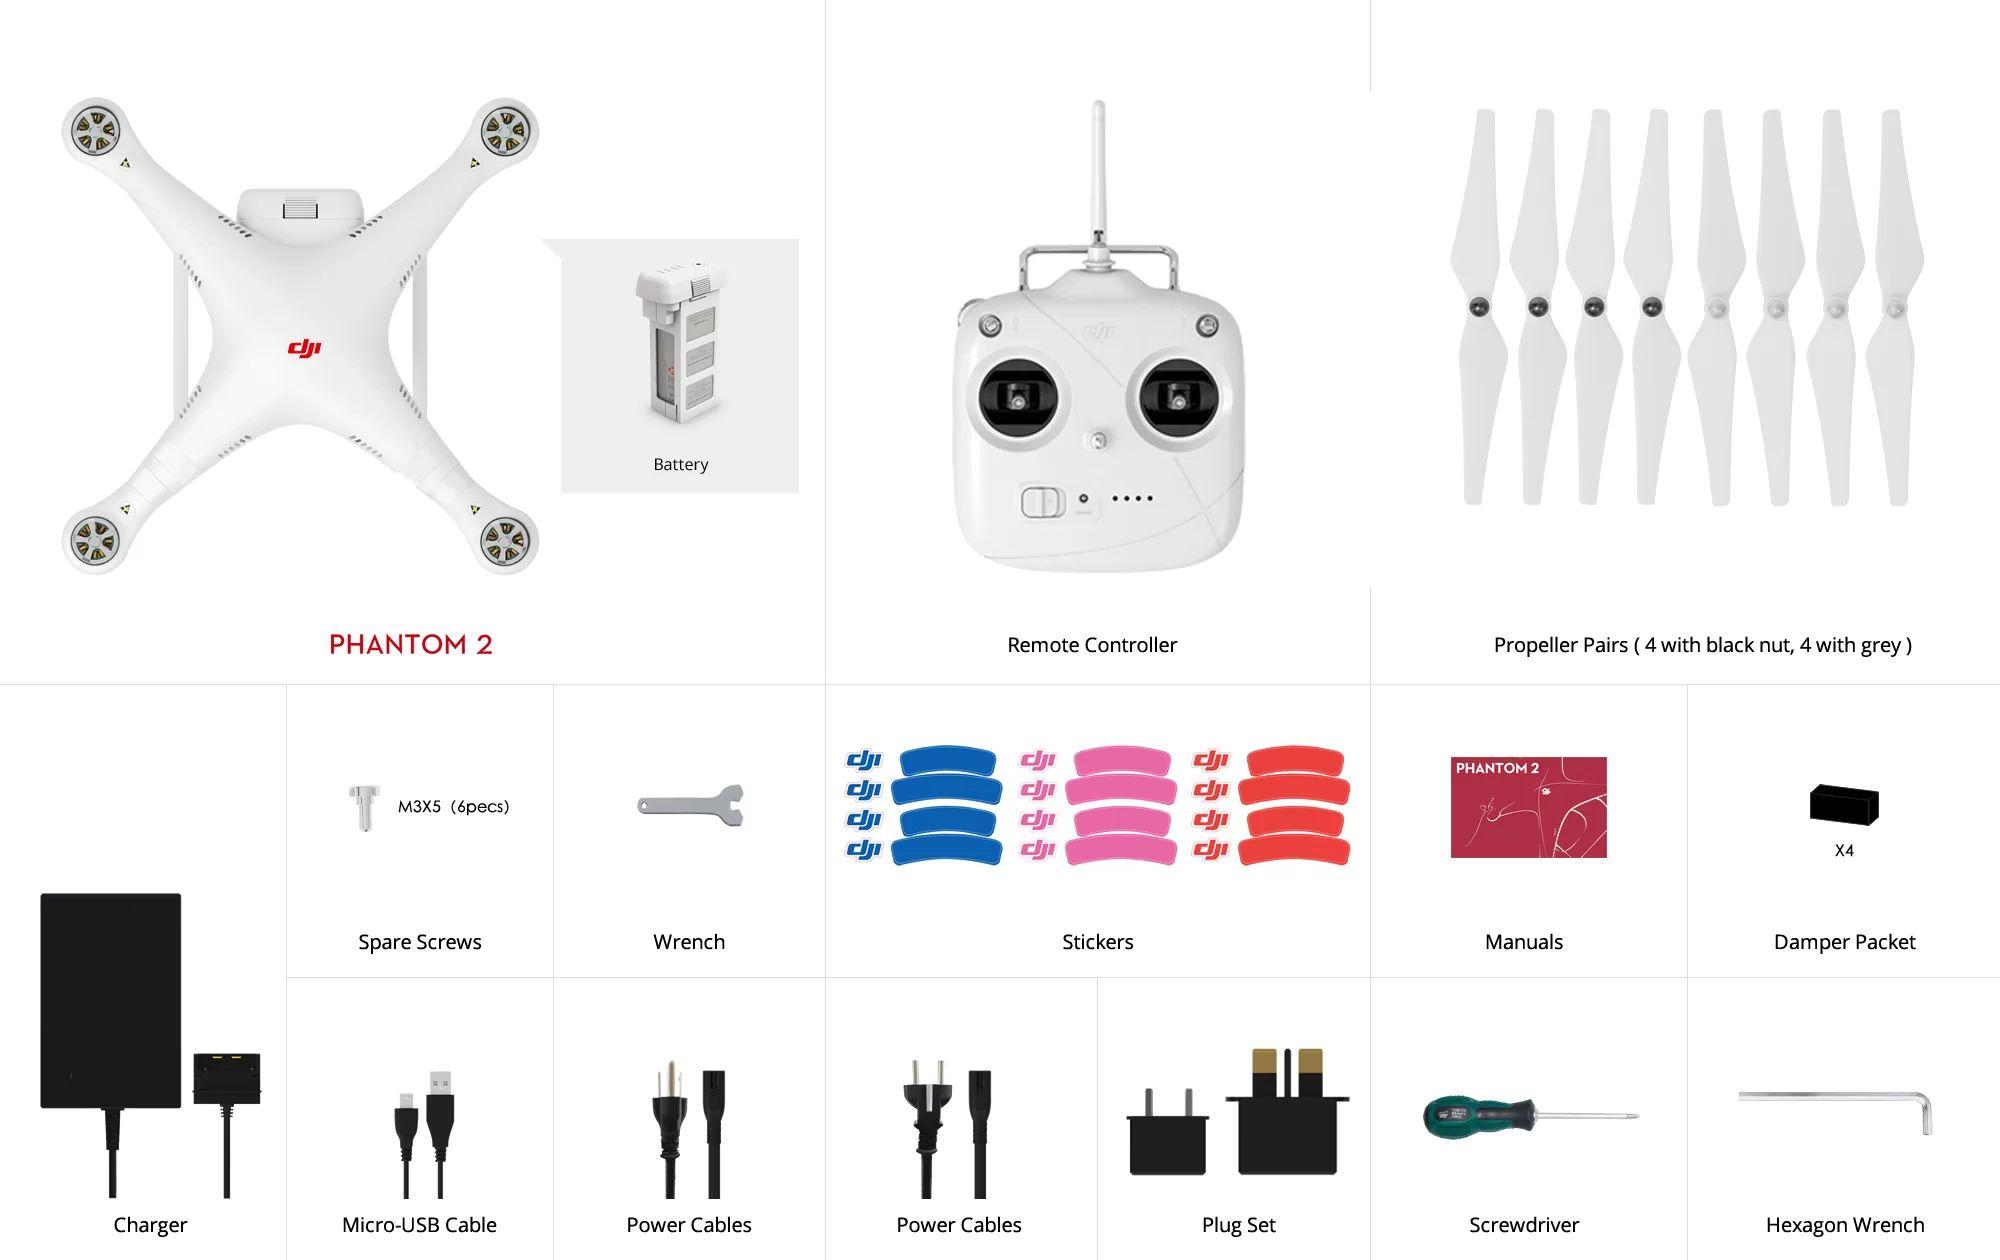 phantom supply from batteries